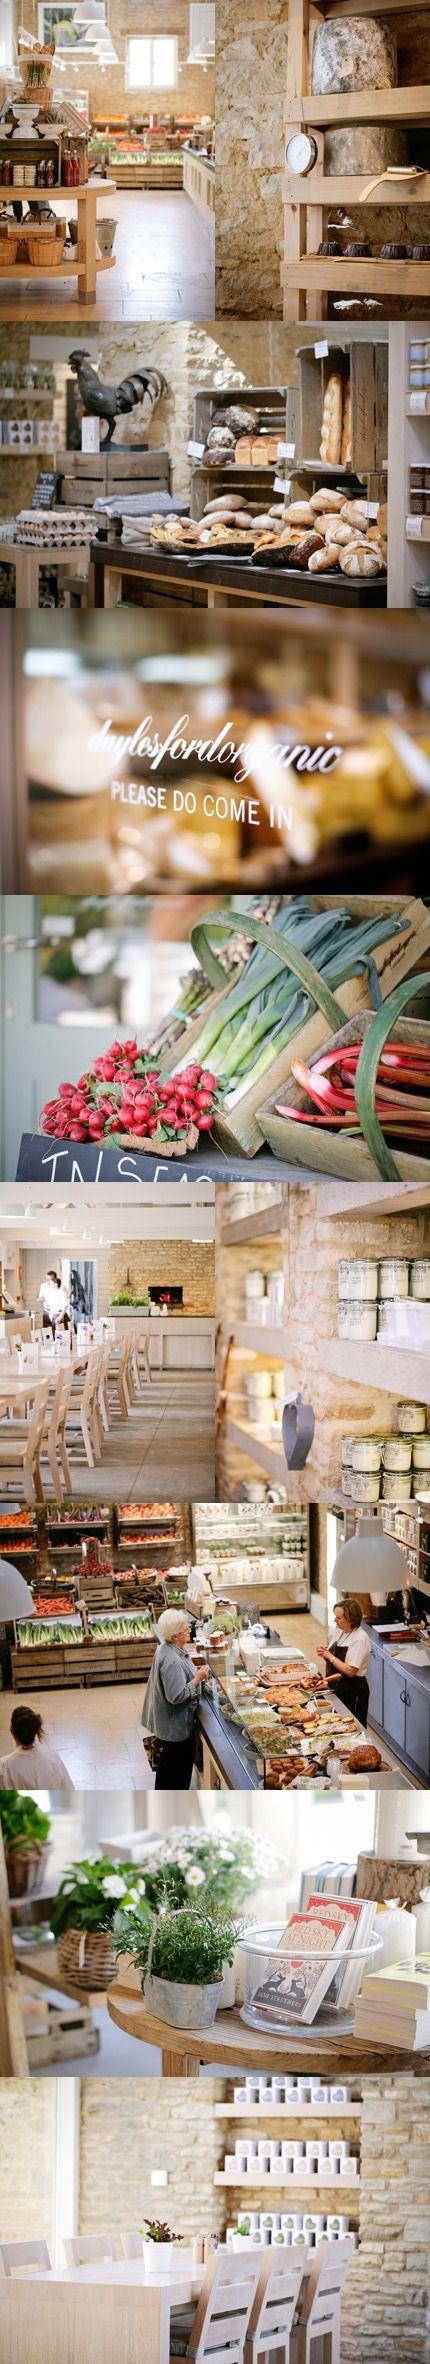 daylesford organic | my favourite farmshop